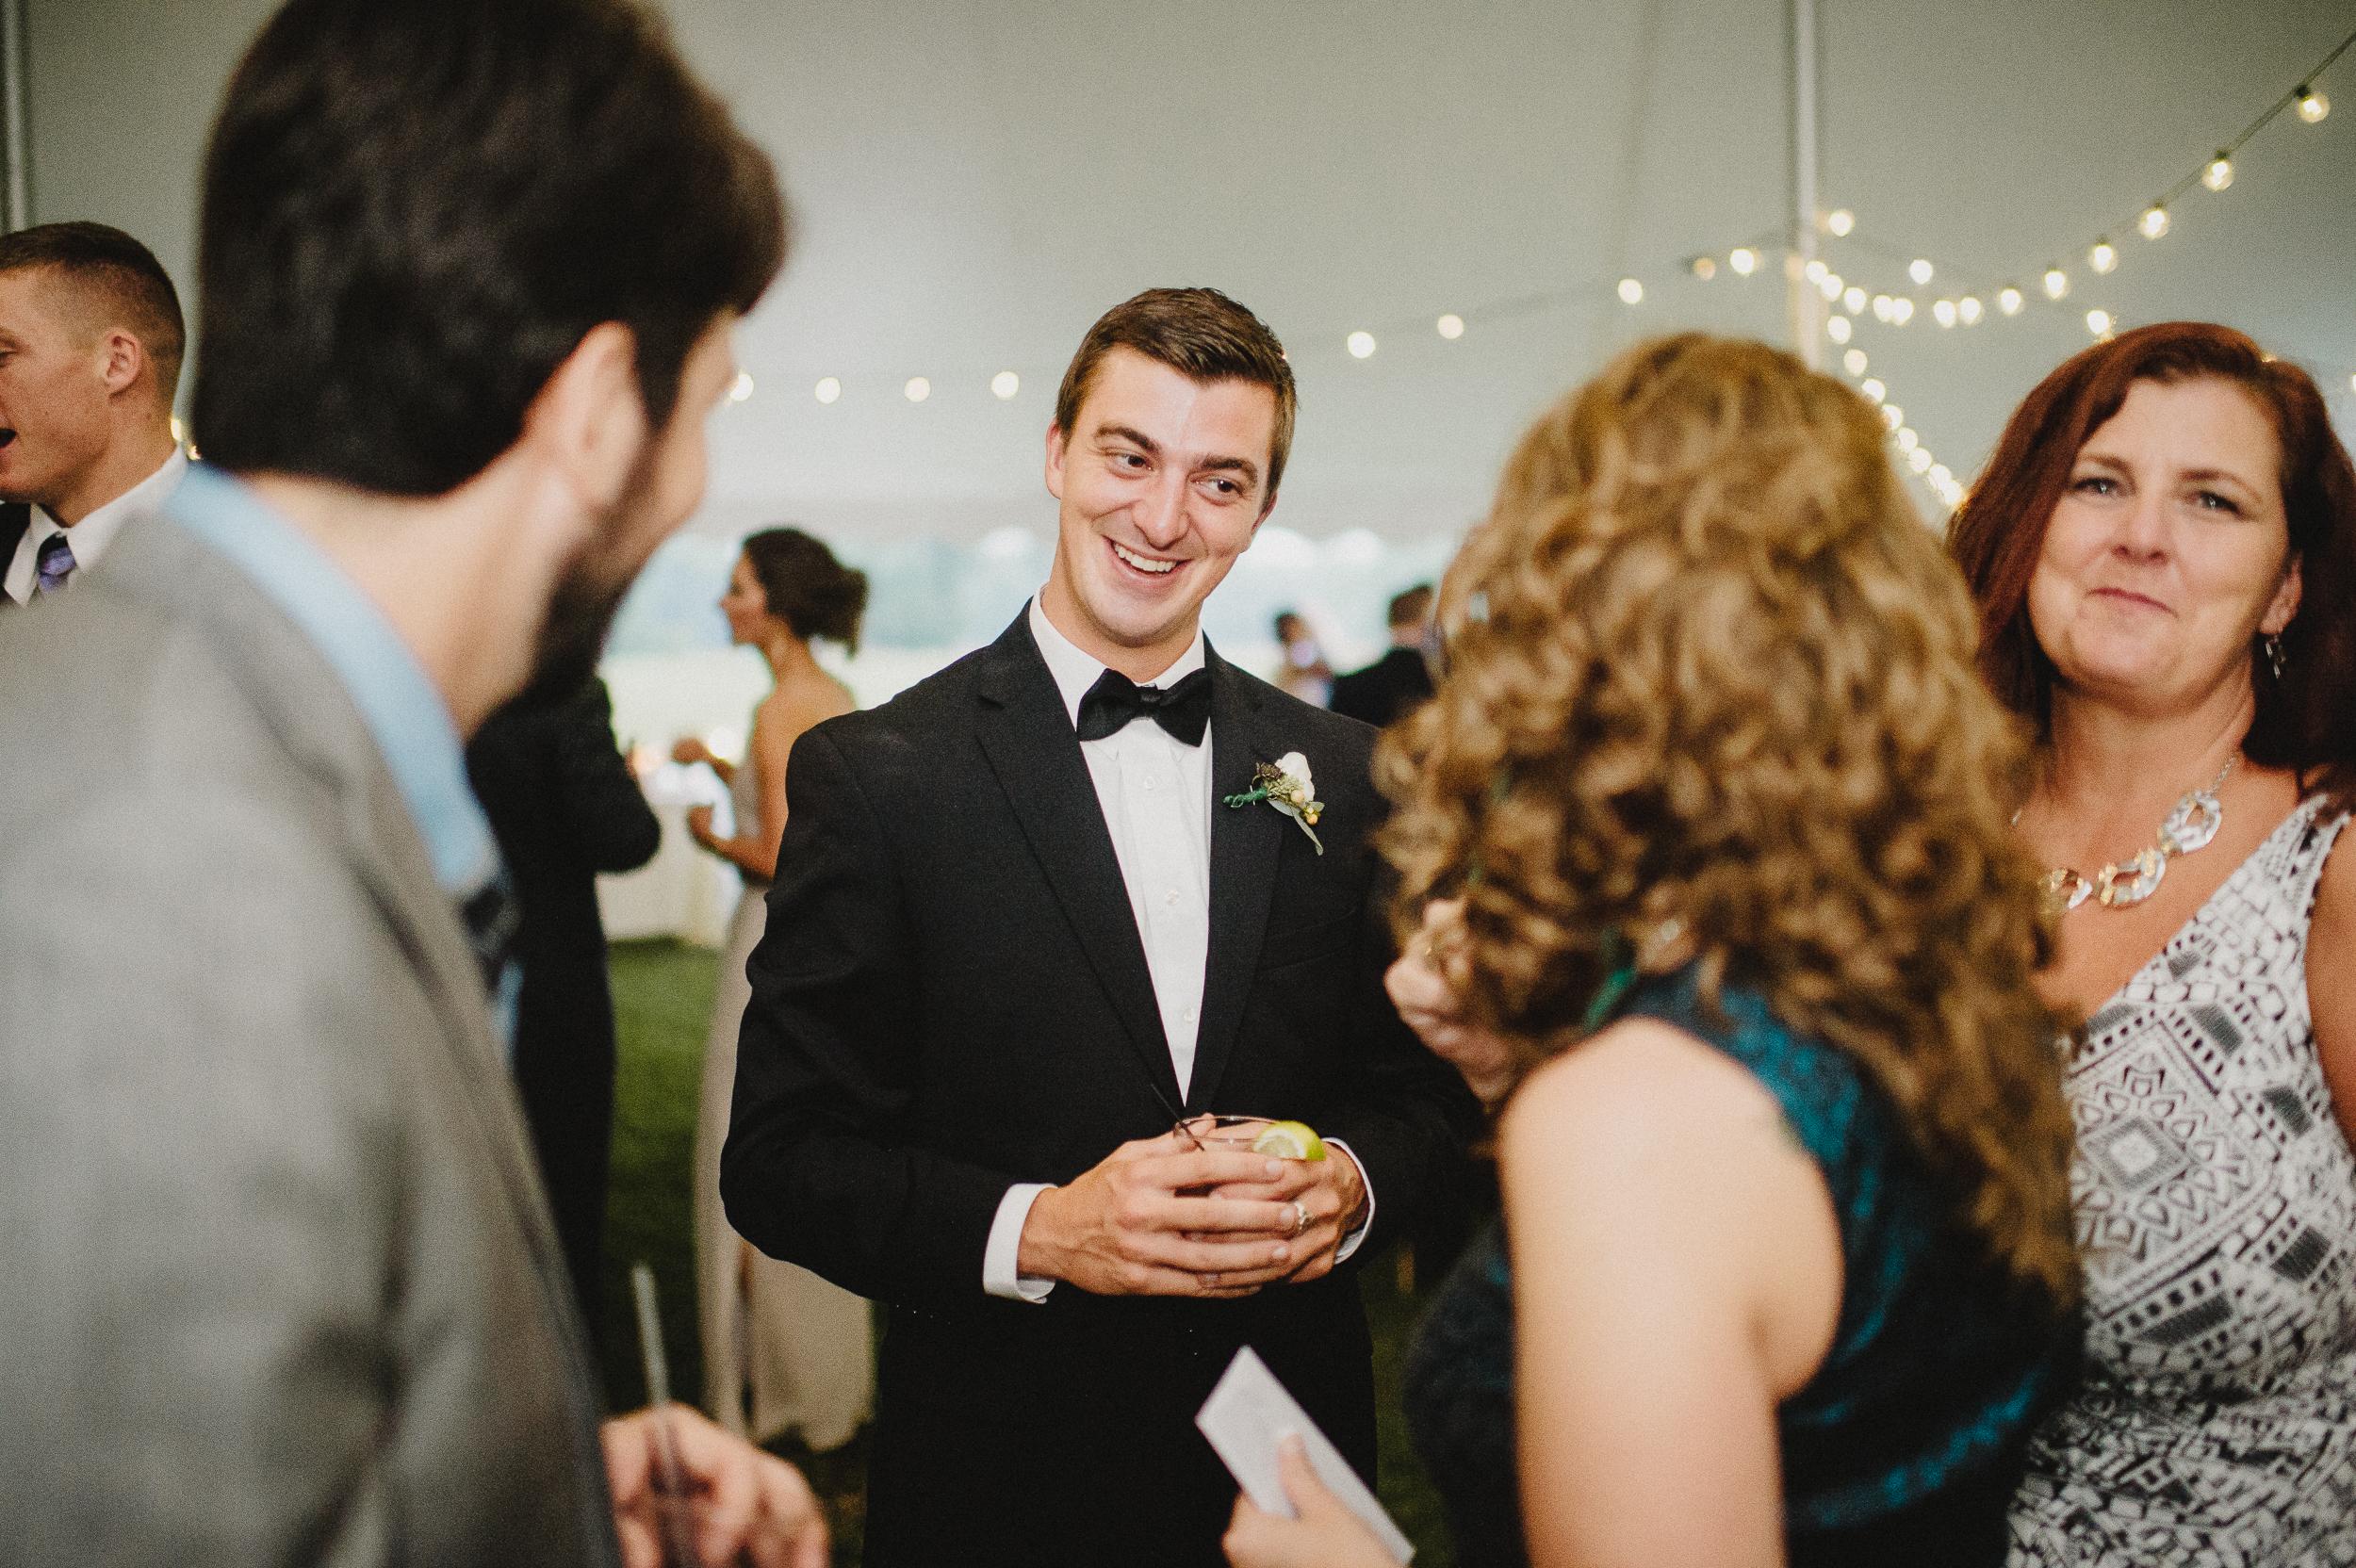 delaware-estate-wedding-photographer-pat-robinson-photography-100.jpg